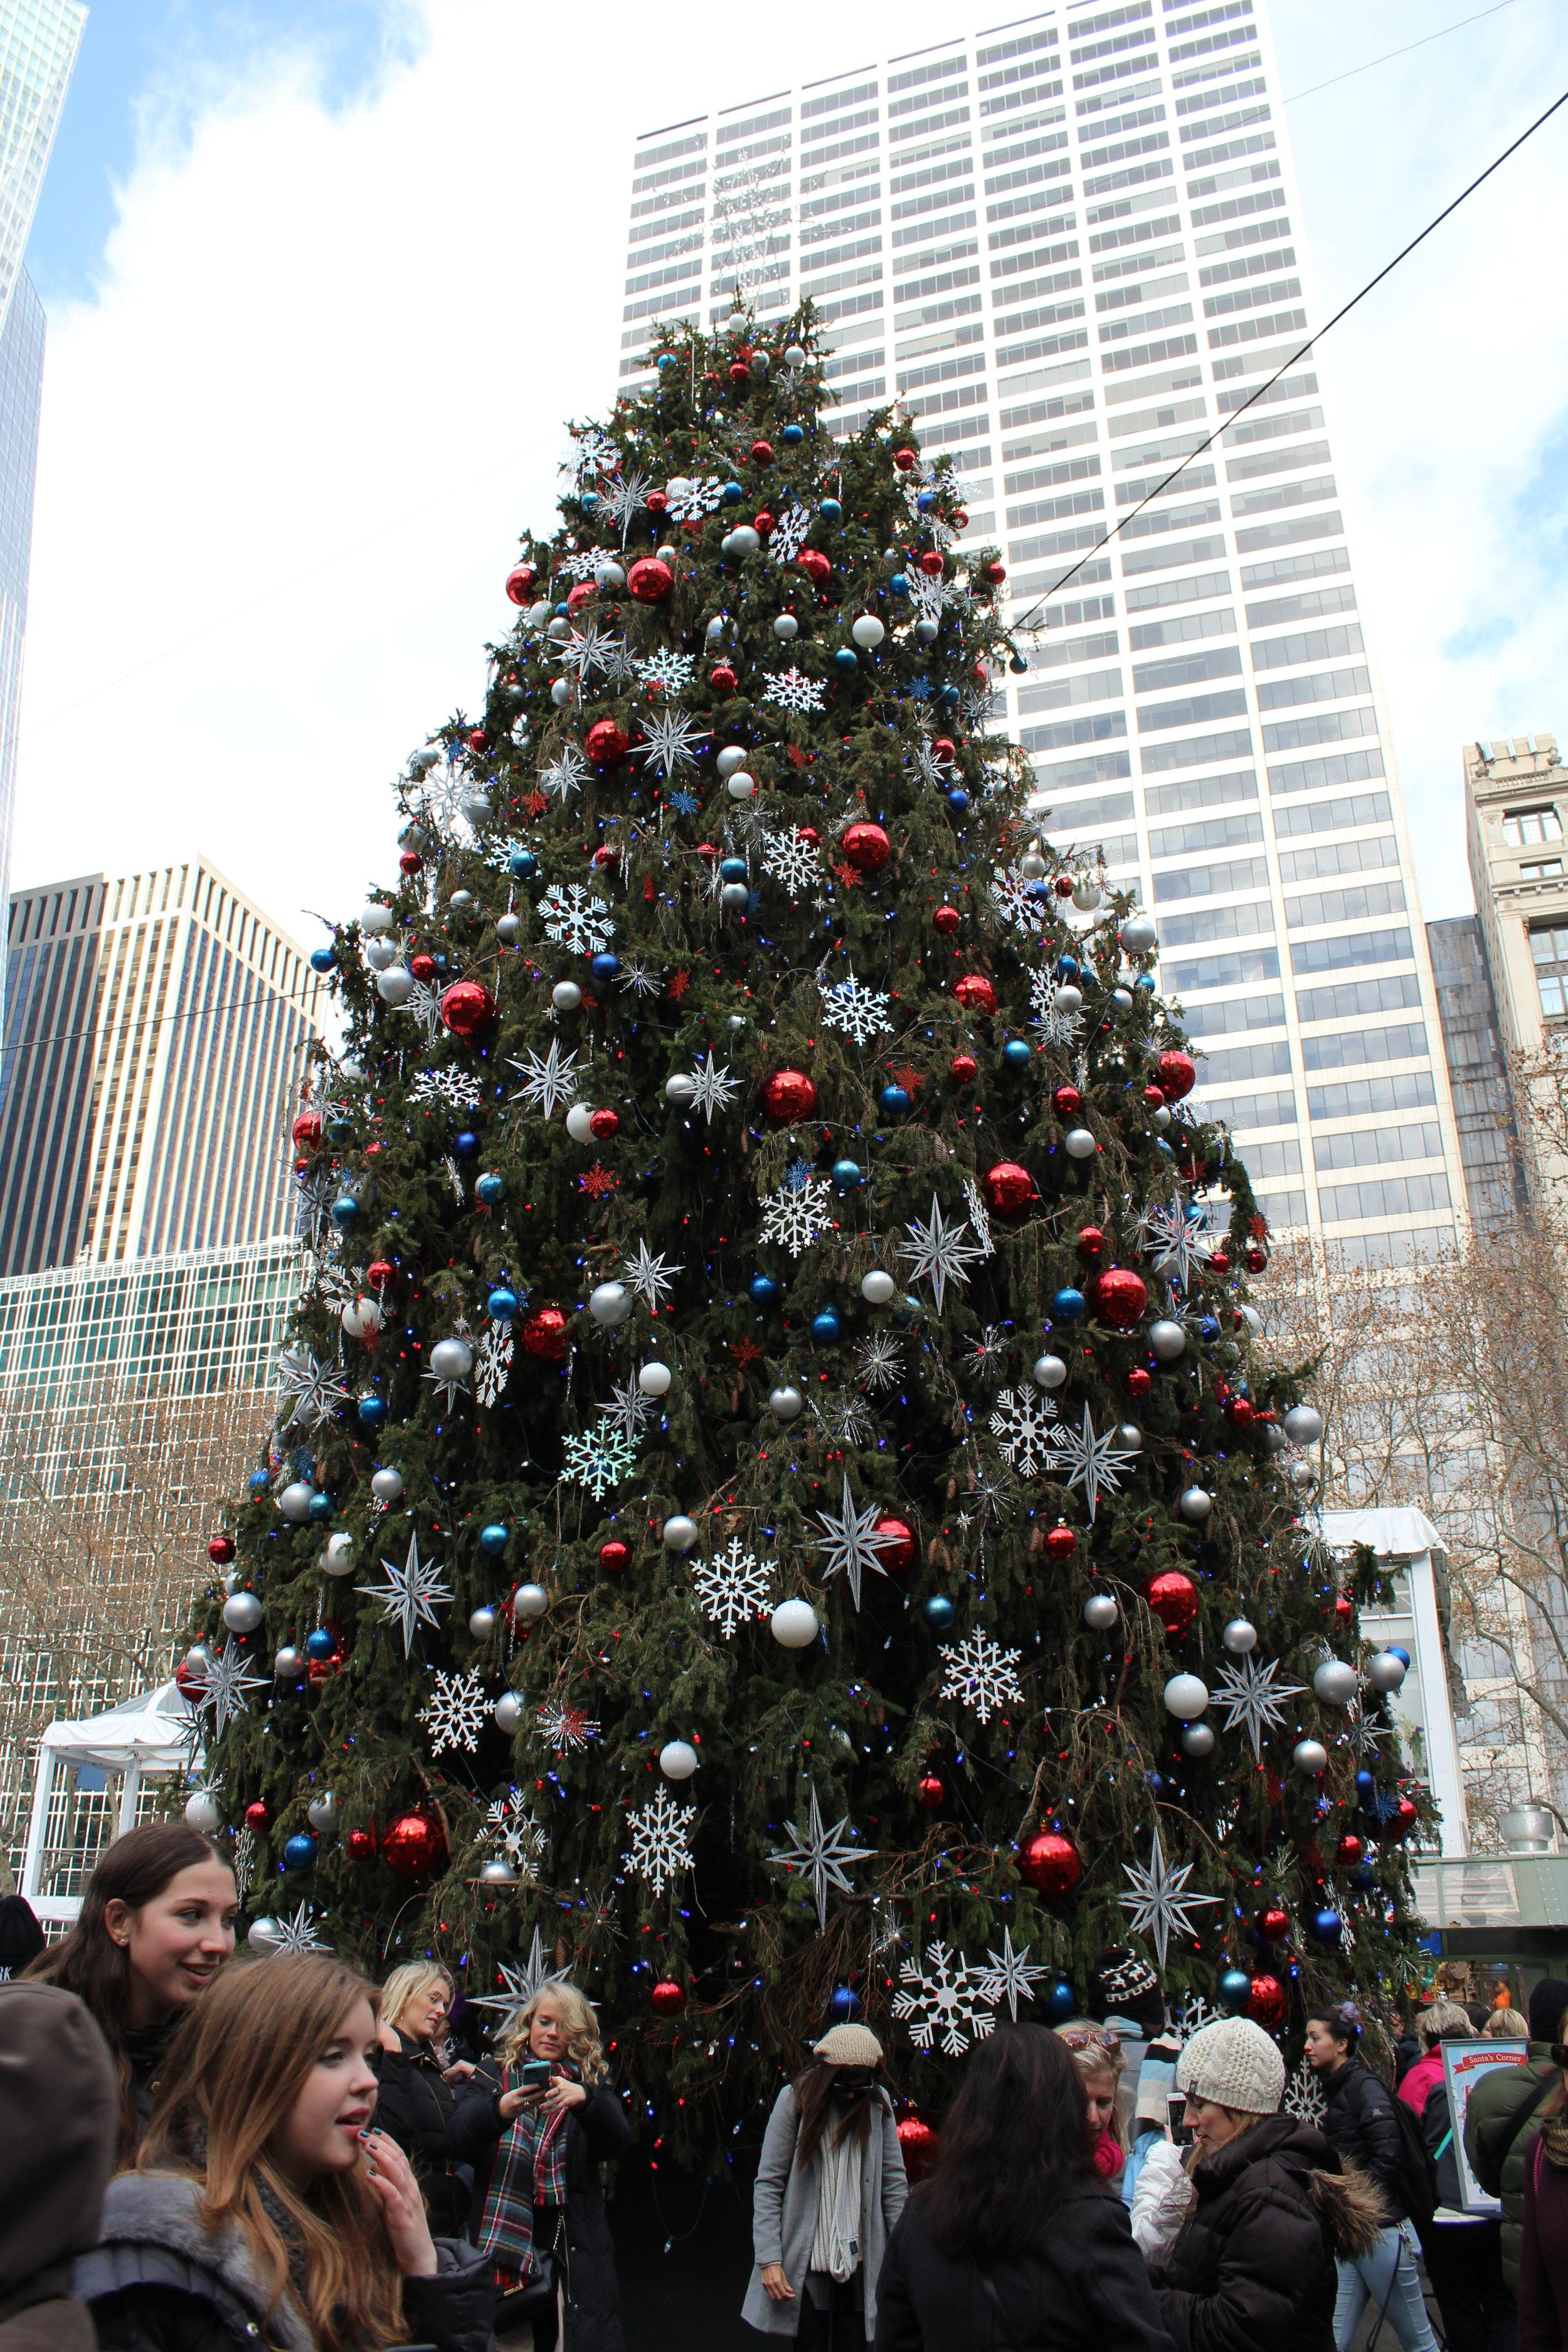 Bryant Park Winter Village Christmas Tree